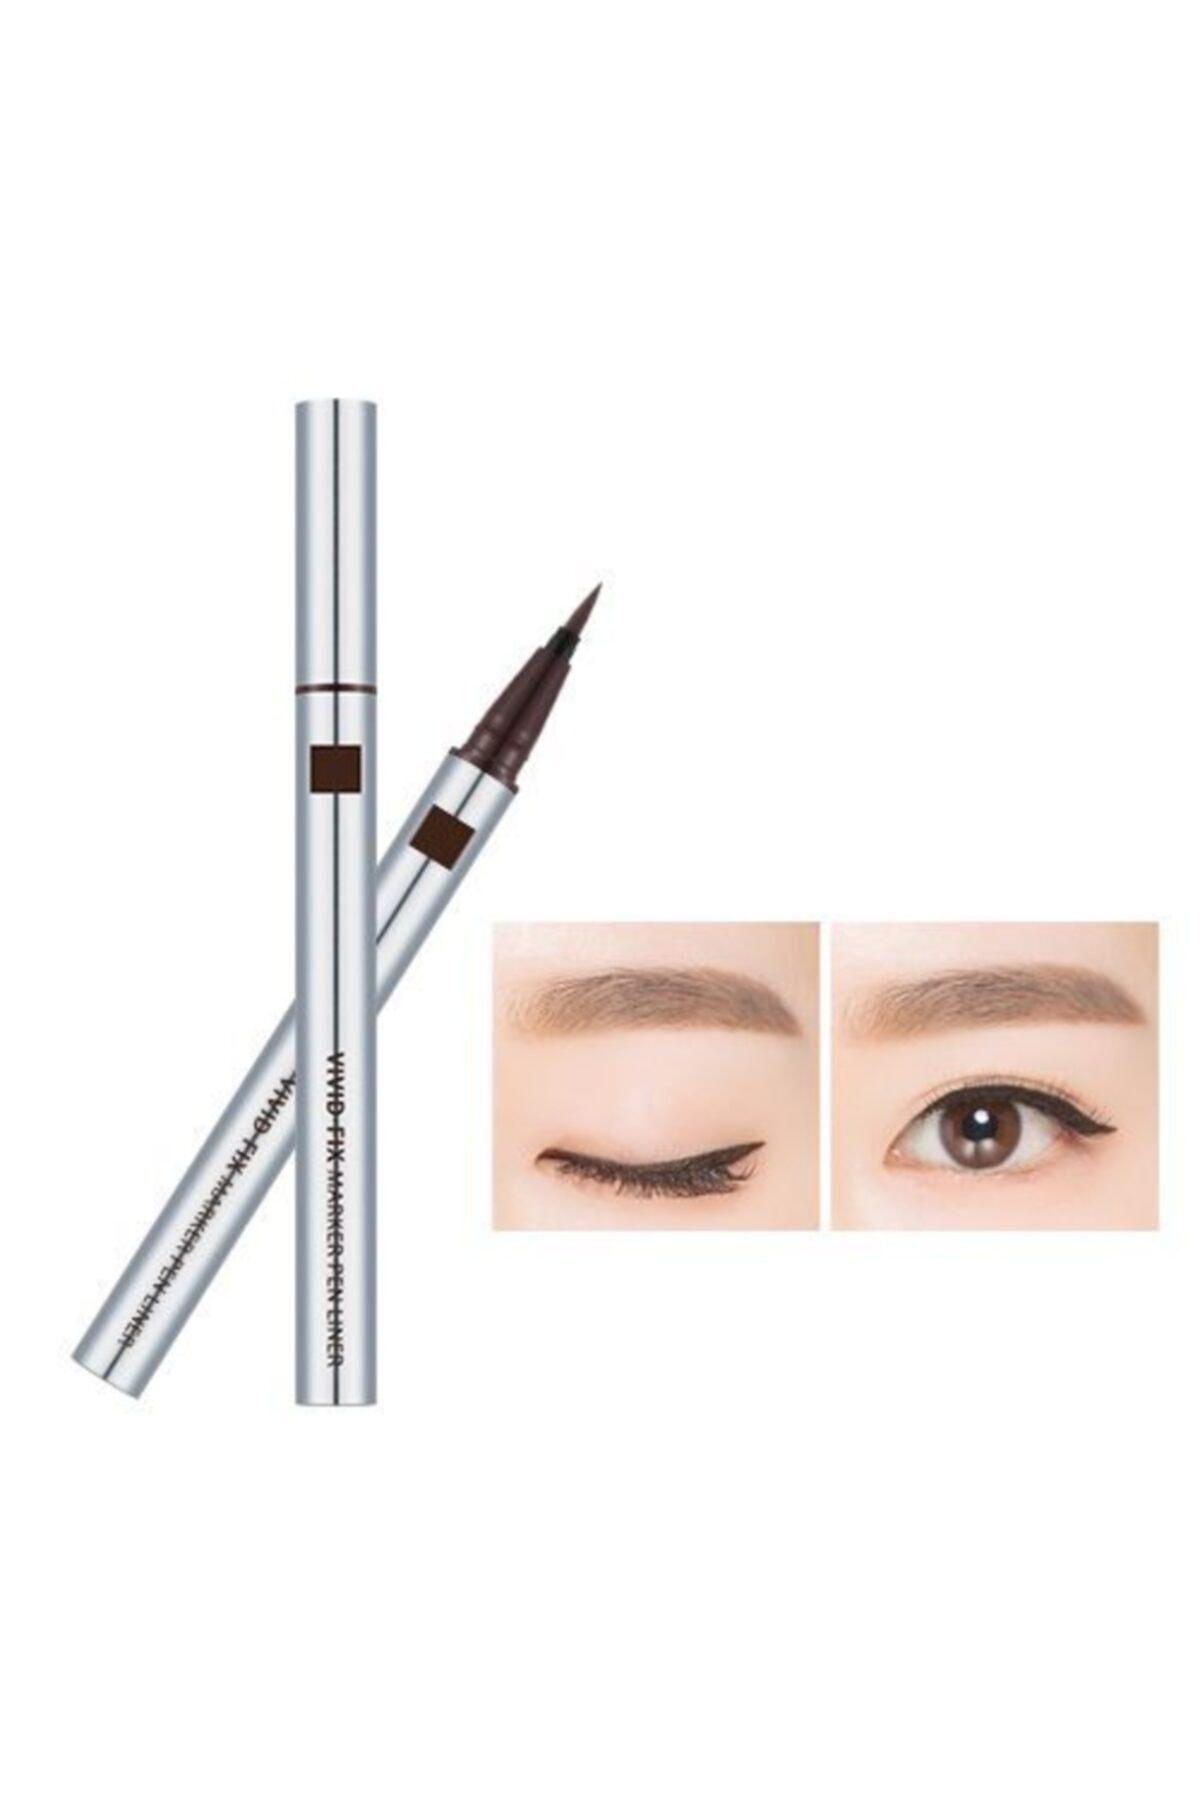 Missha Vivid Fix Marker Pen Liner (Deep Brown) 1